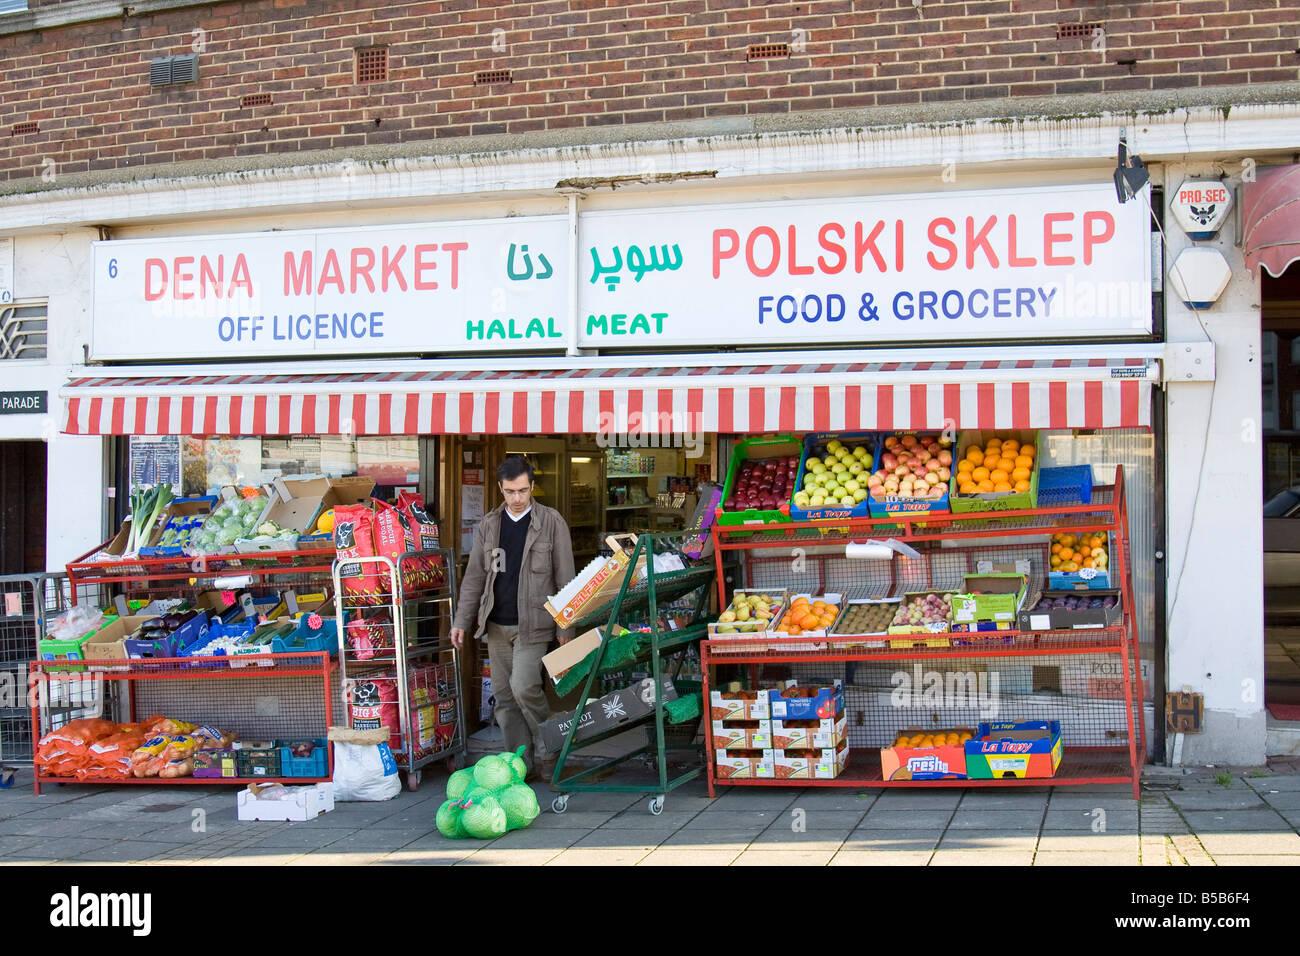 09c86b484de6d Polski Sklep Stock Photos & Polski Sklep Stock Images - Alamy